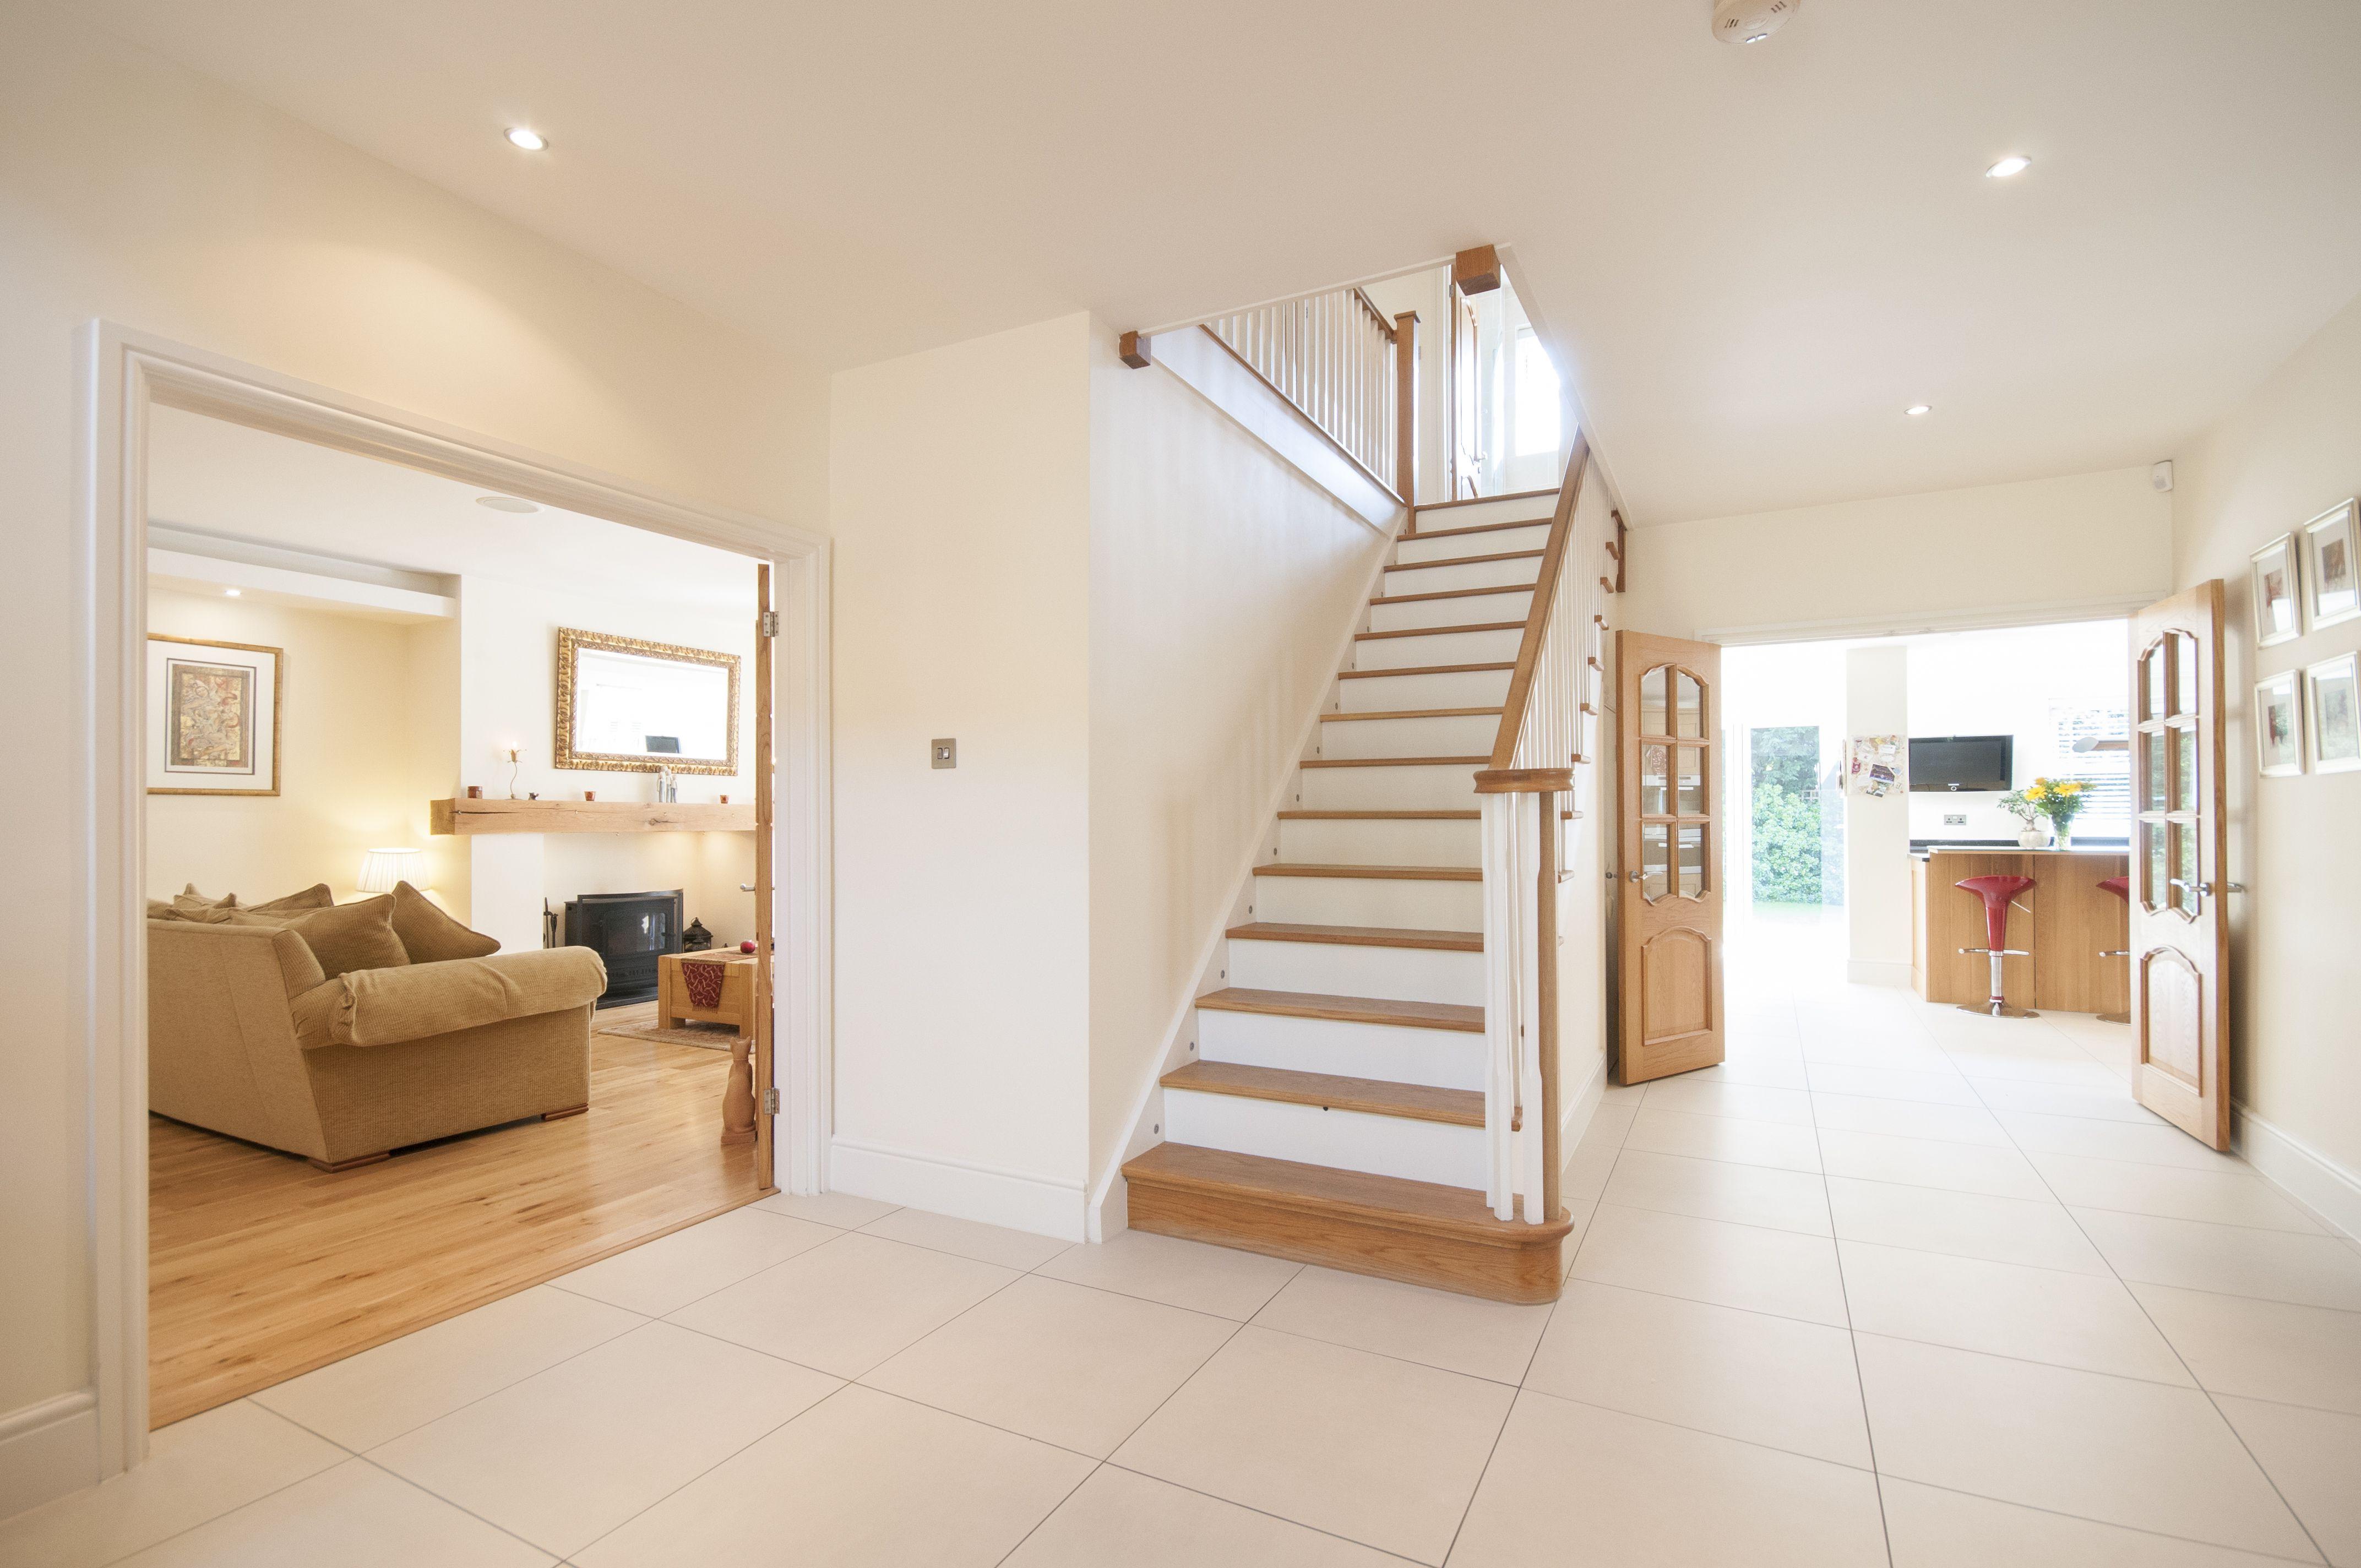 transition between tile and hardwood floor of tile to wood floor transitions in home extior interiors 533831266 57ee97fd5f9b586c3540f1f1